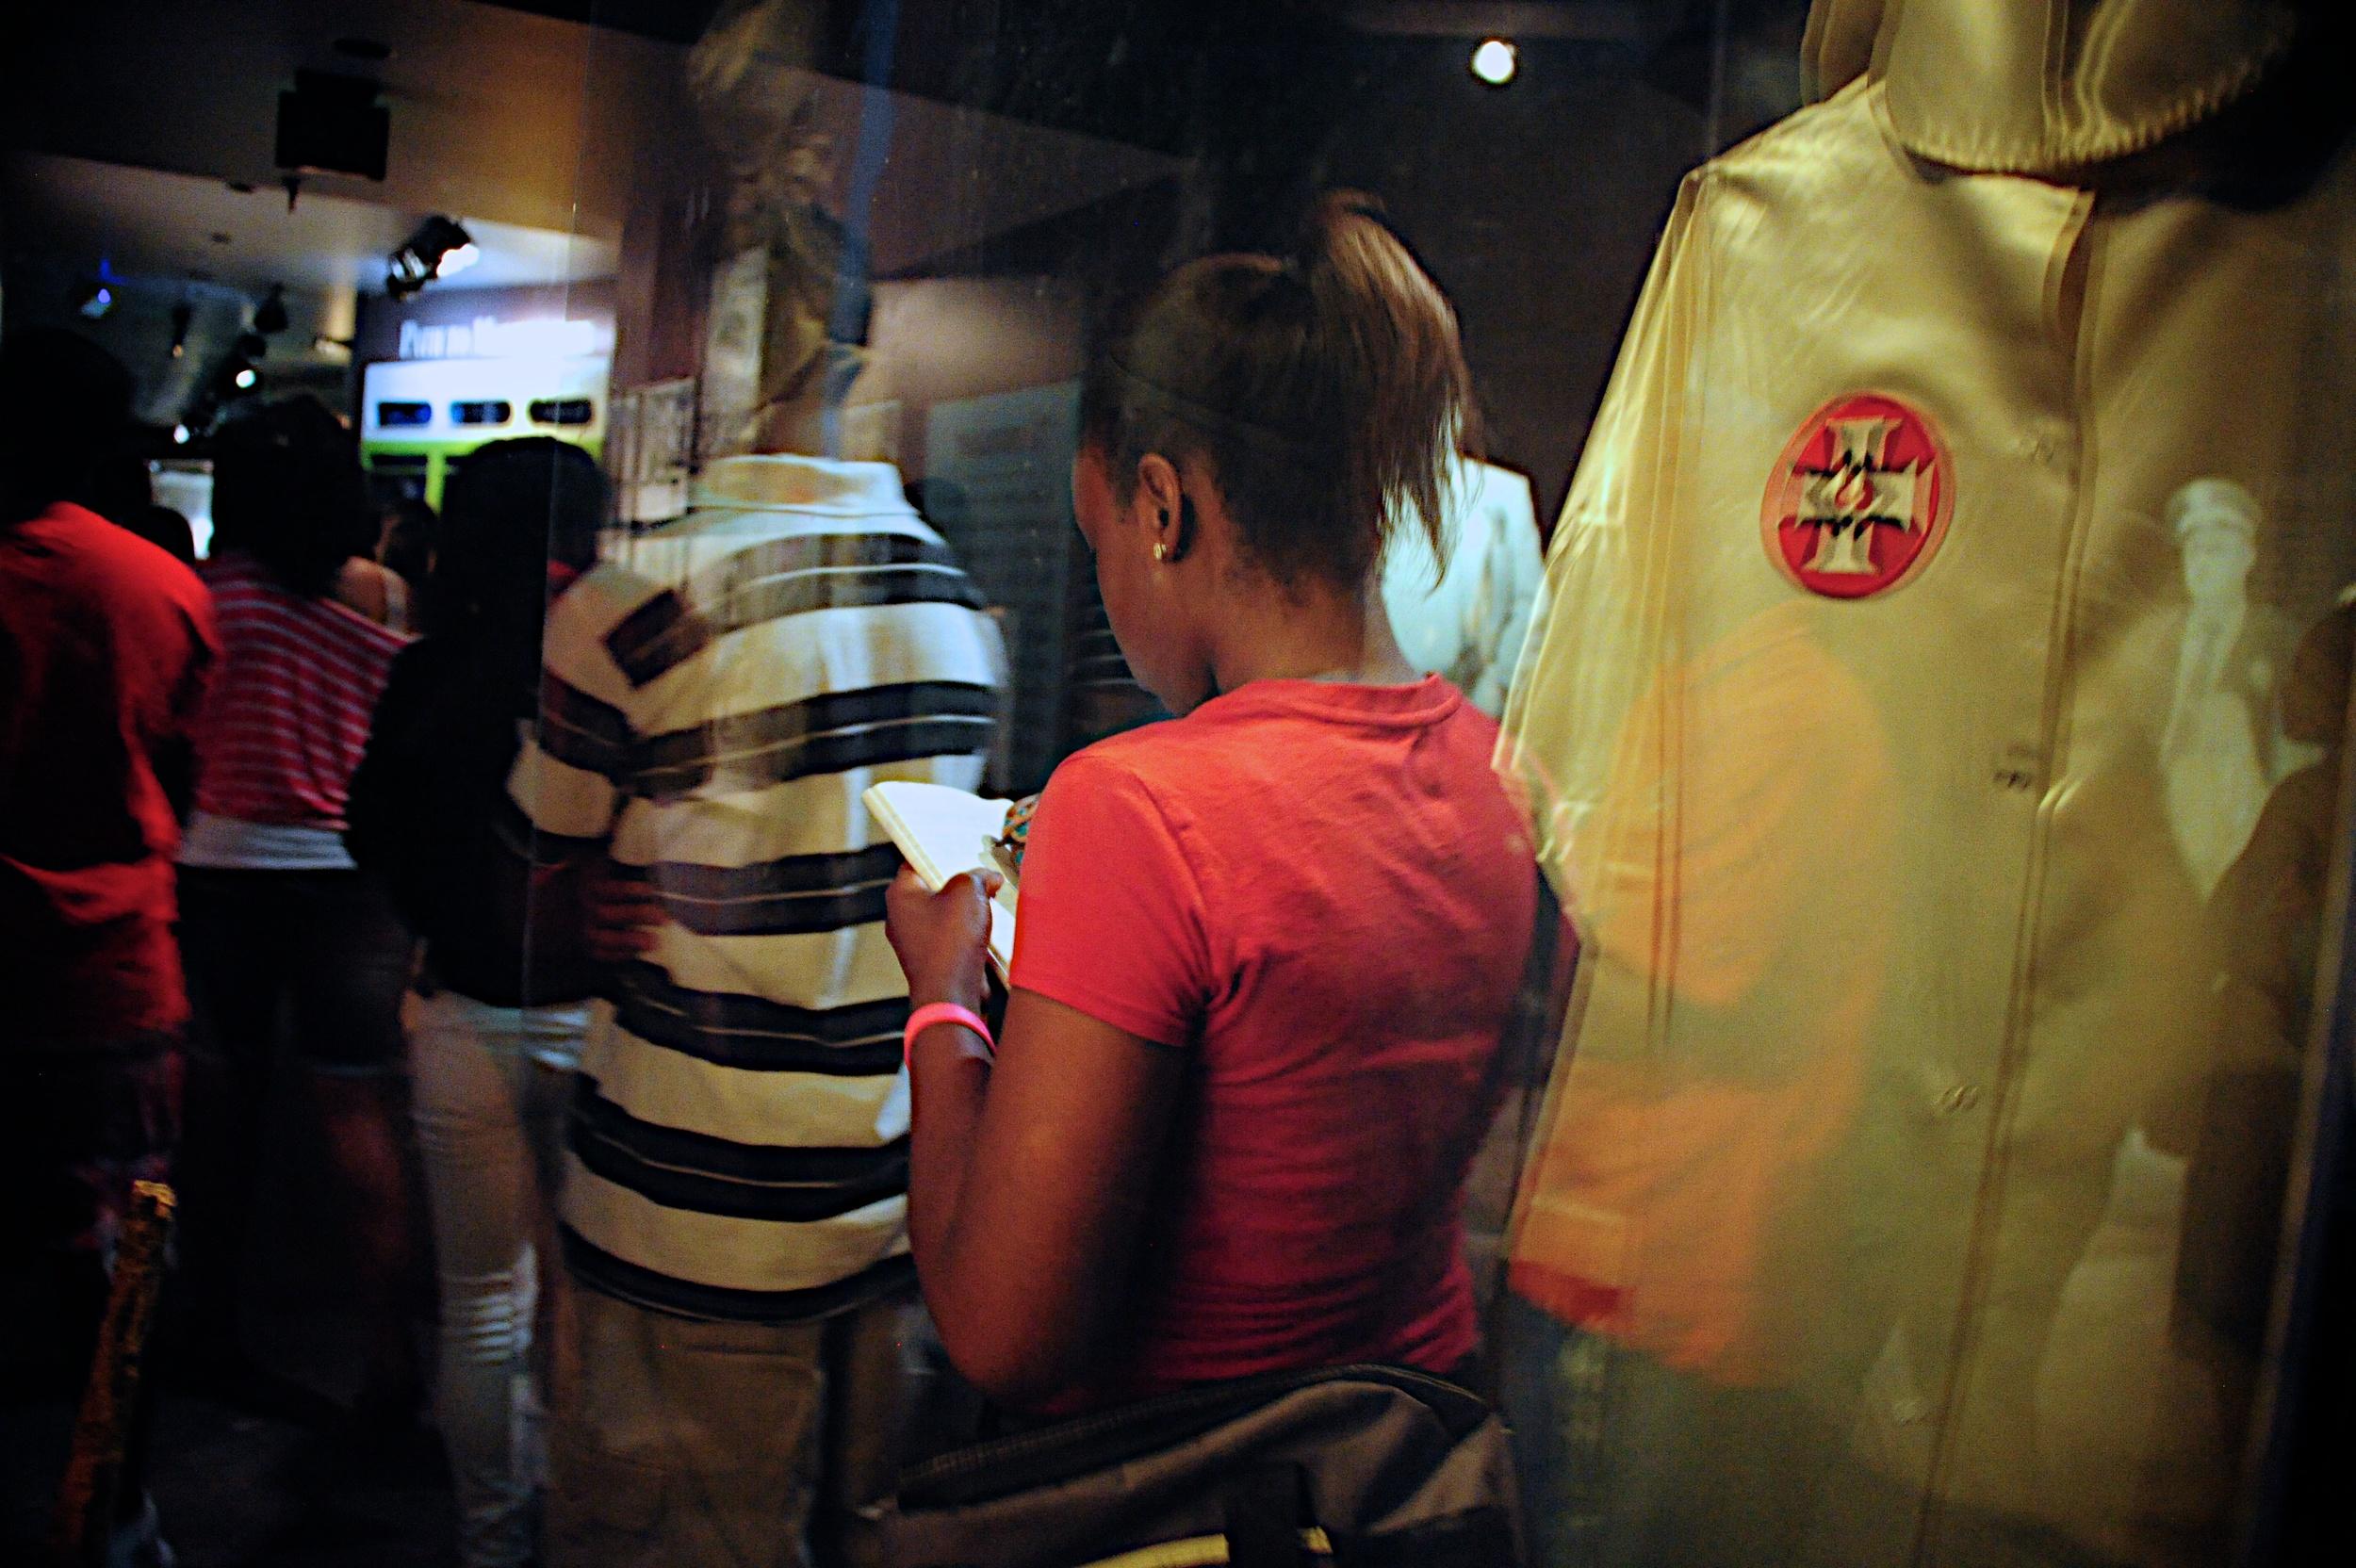 Birmingham Civil Rights Institute KKK cloak reflection 8799.jpg